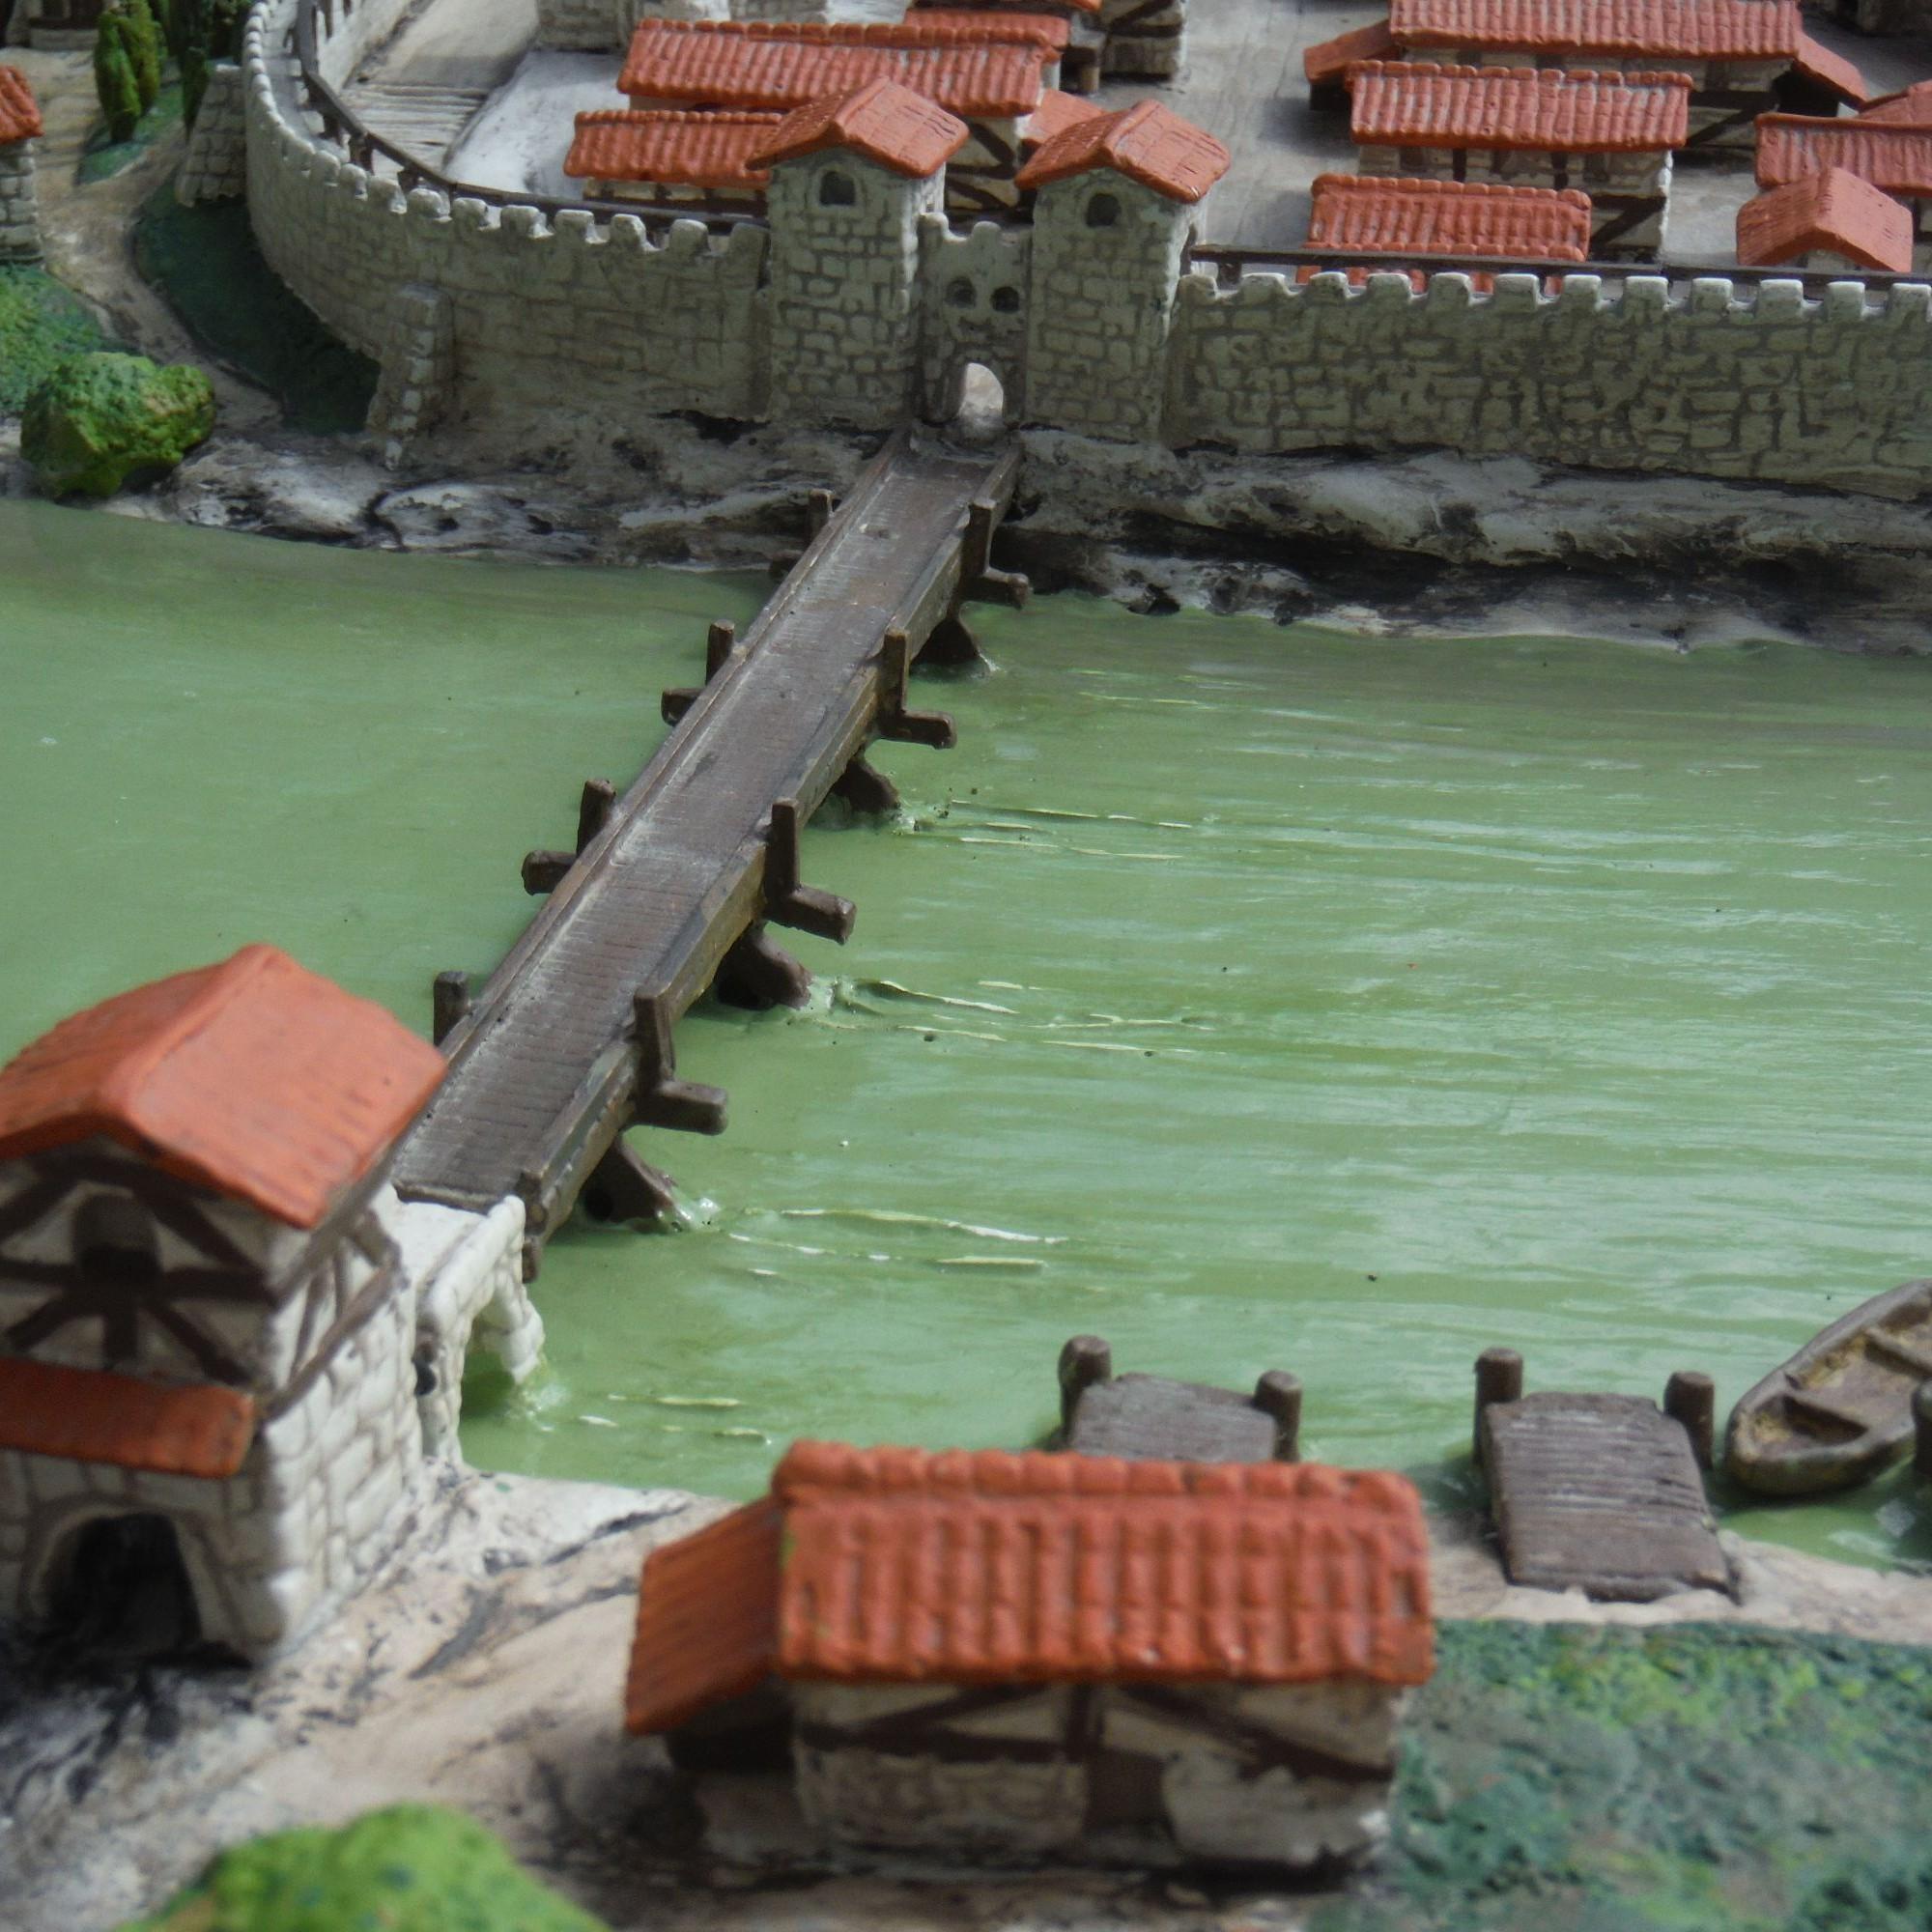 Olodunum: Aarebrücke